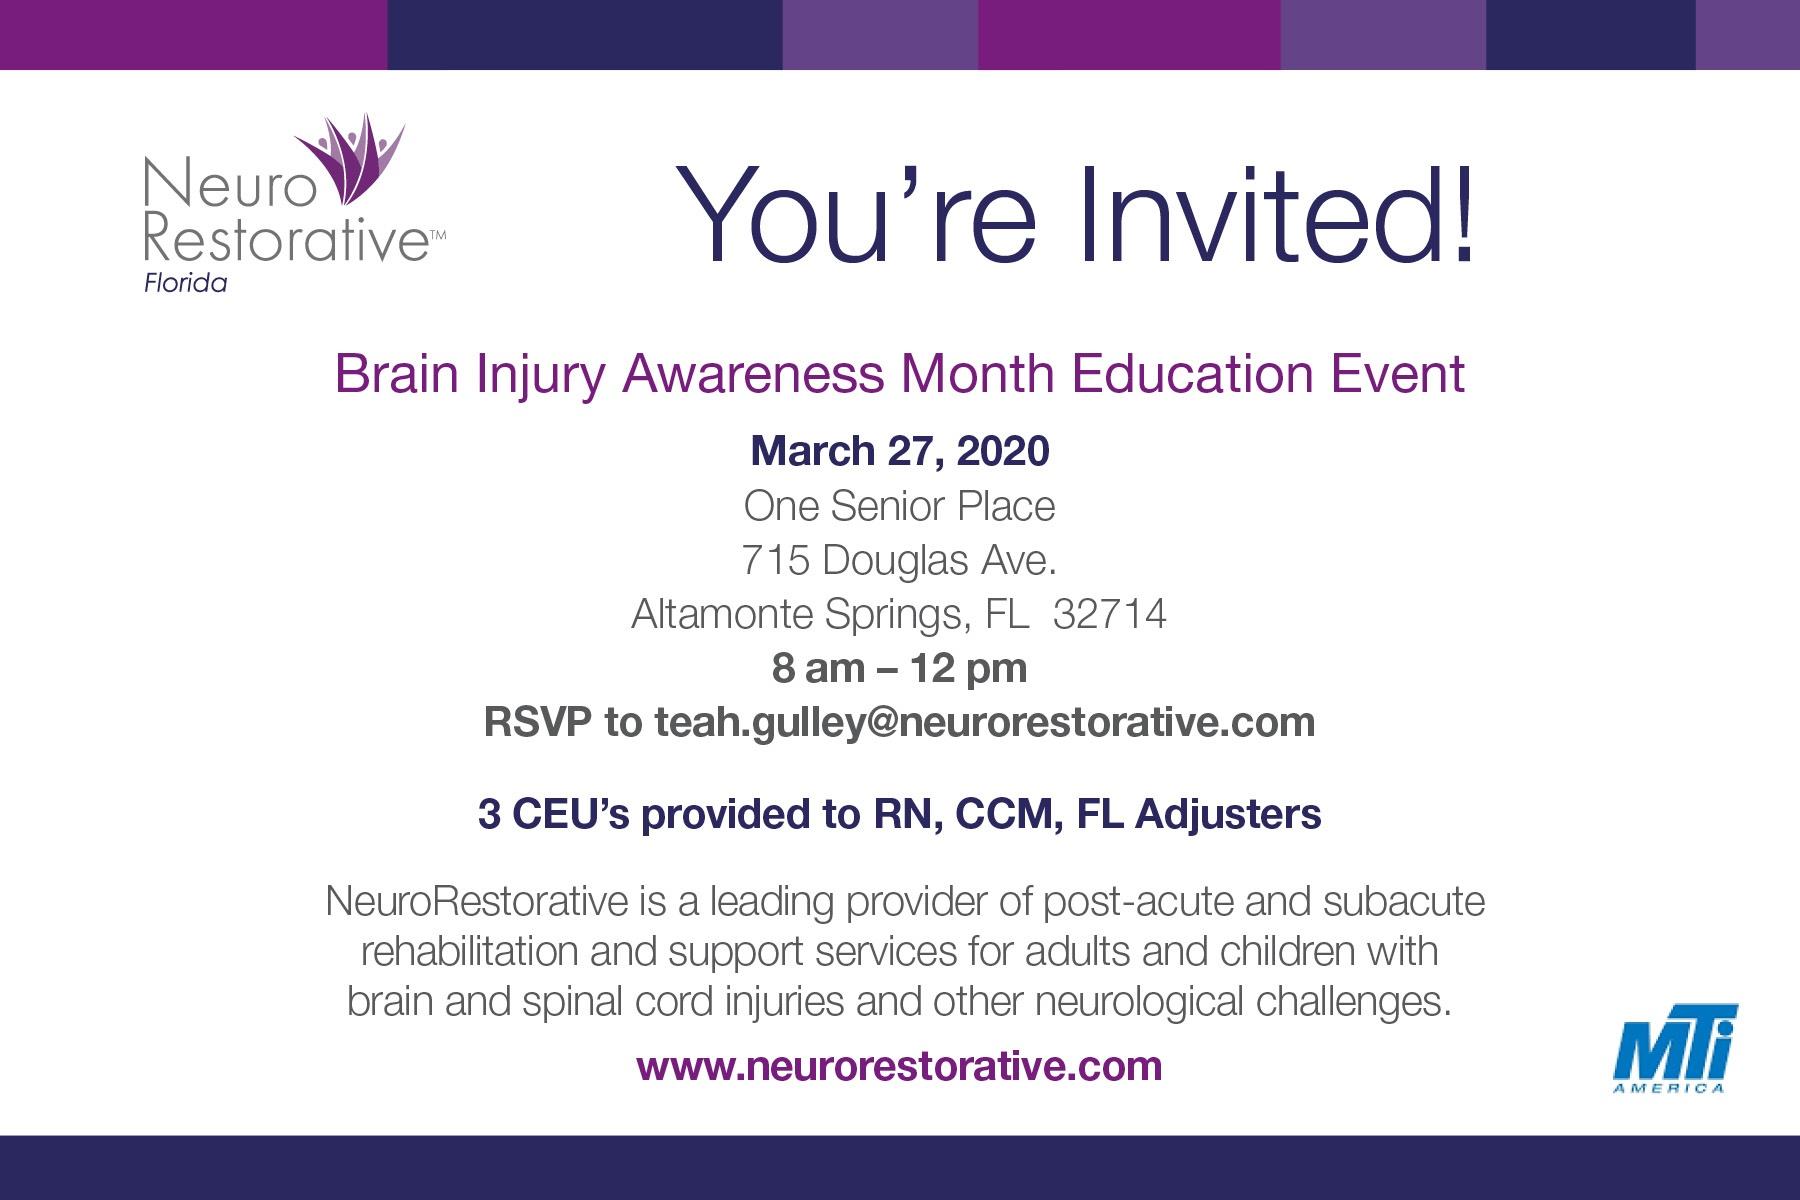 CEU Event - Brain Injury Awareness Month Educational Event